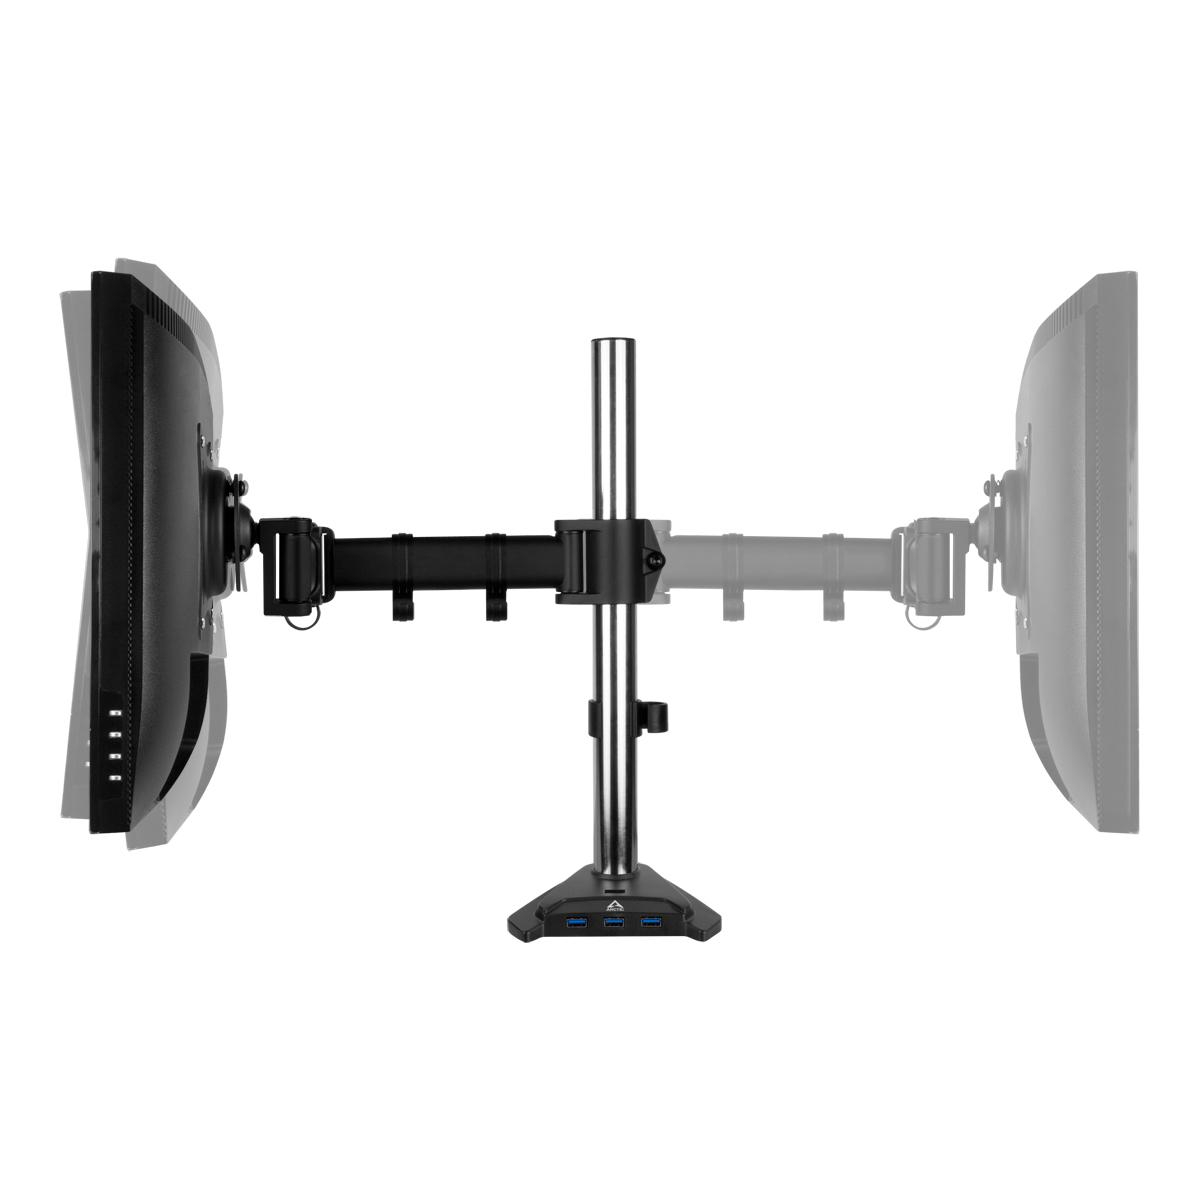 Desk Mount Monitor Arm with SuperSpeed USB Hub ARCTIC Z1 Pro (Gen 3) Tiltable